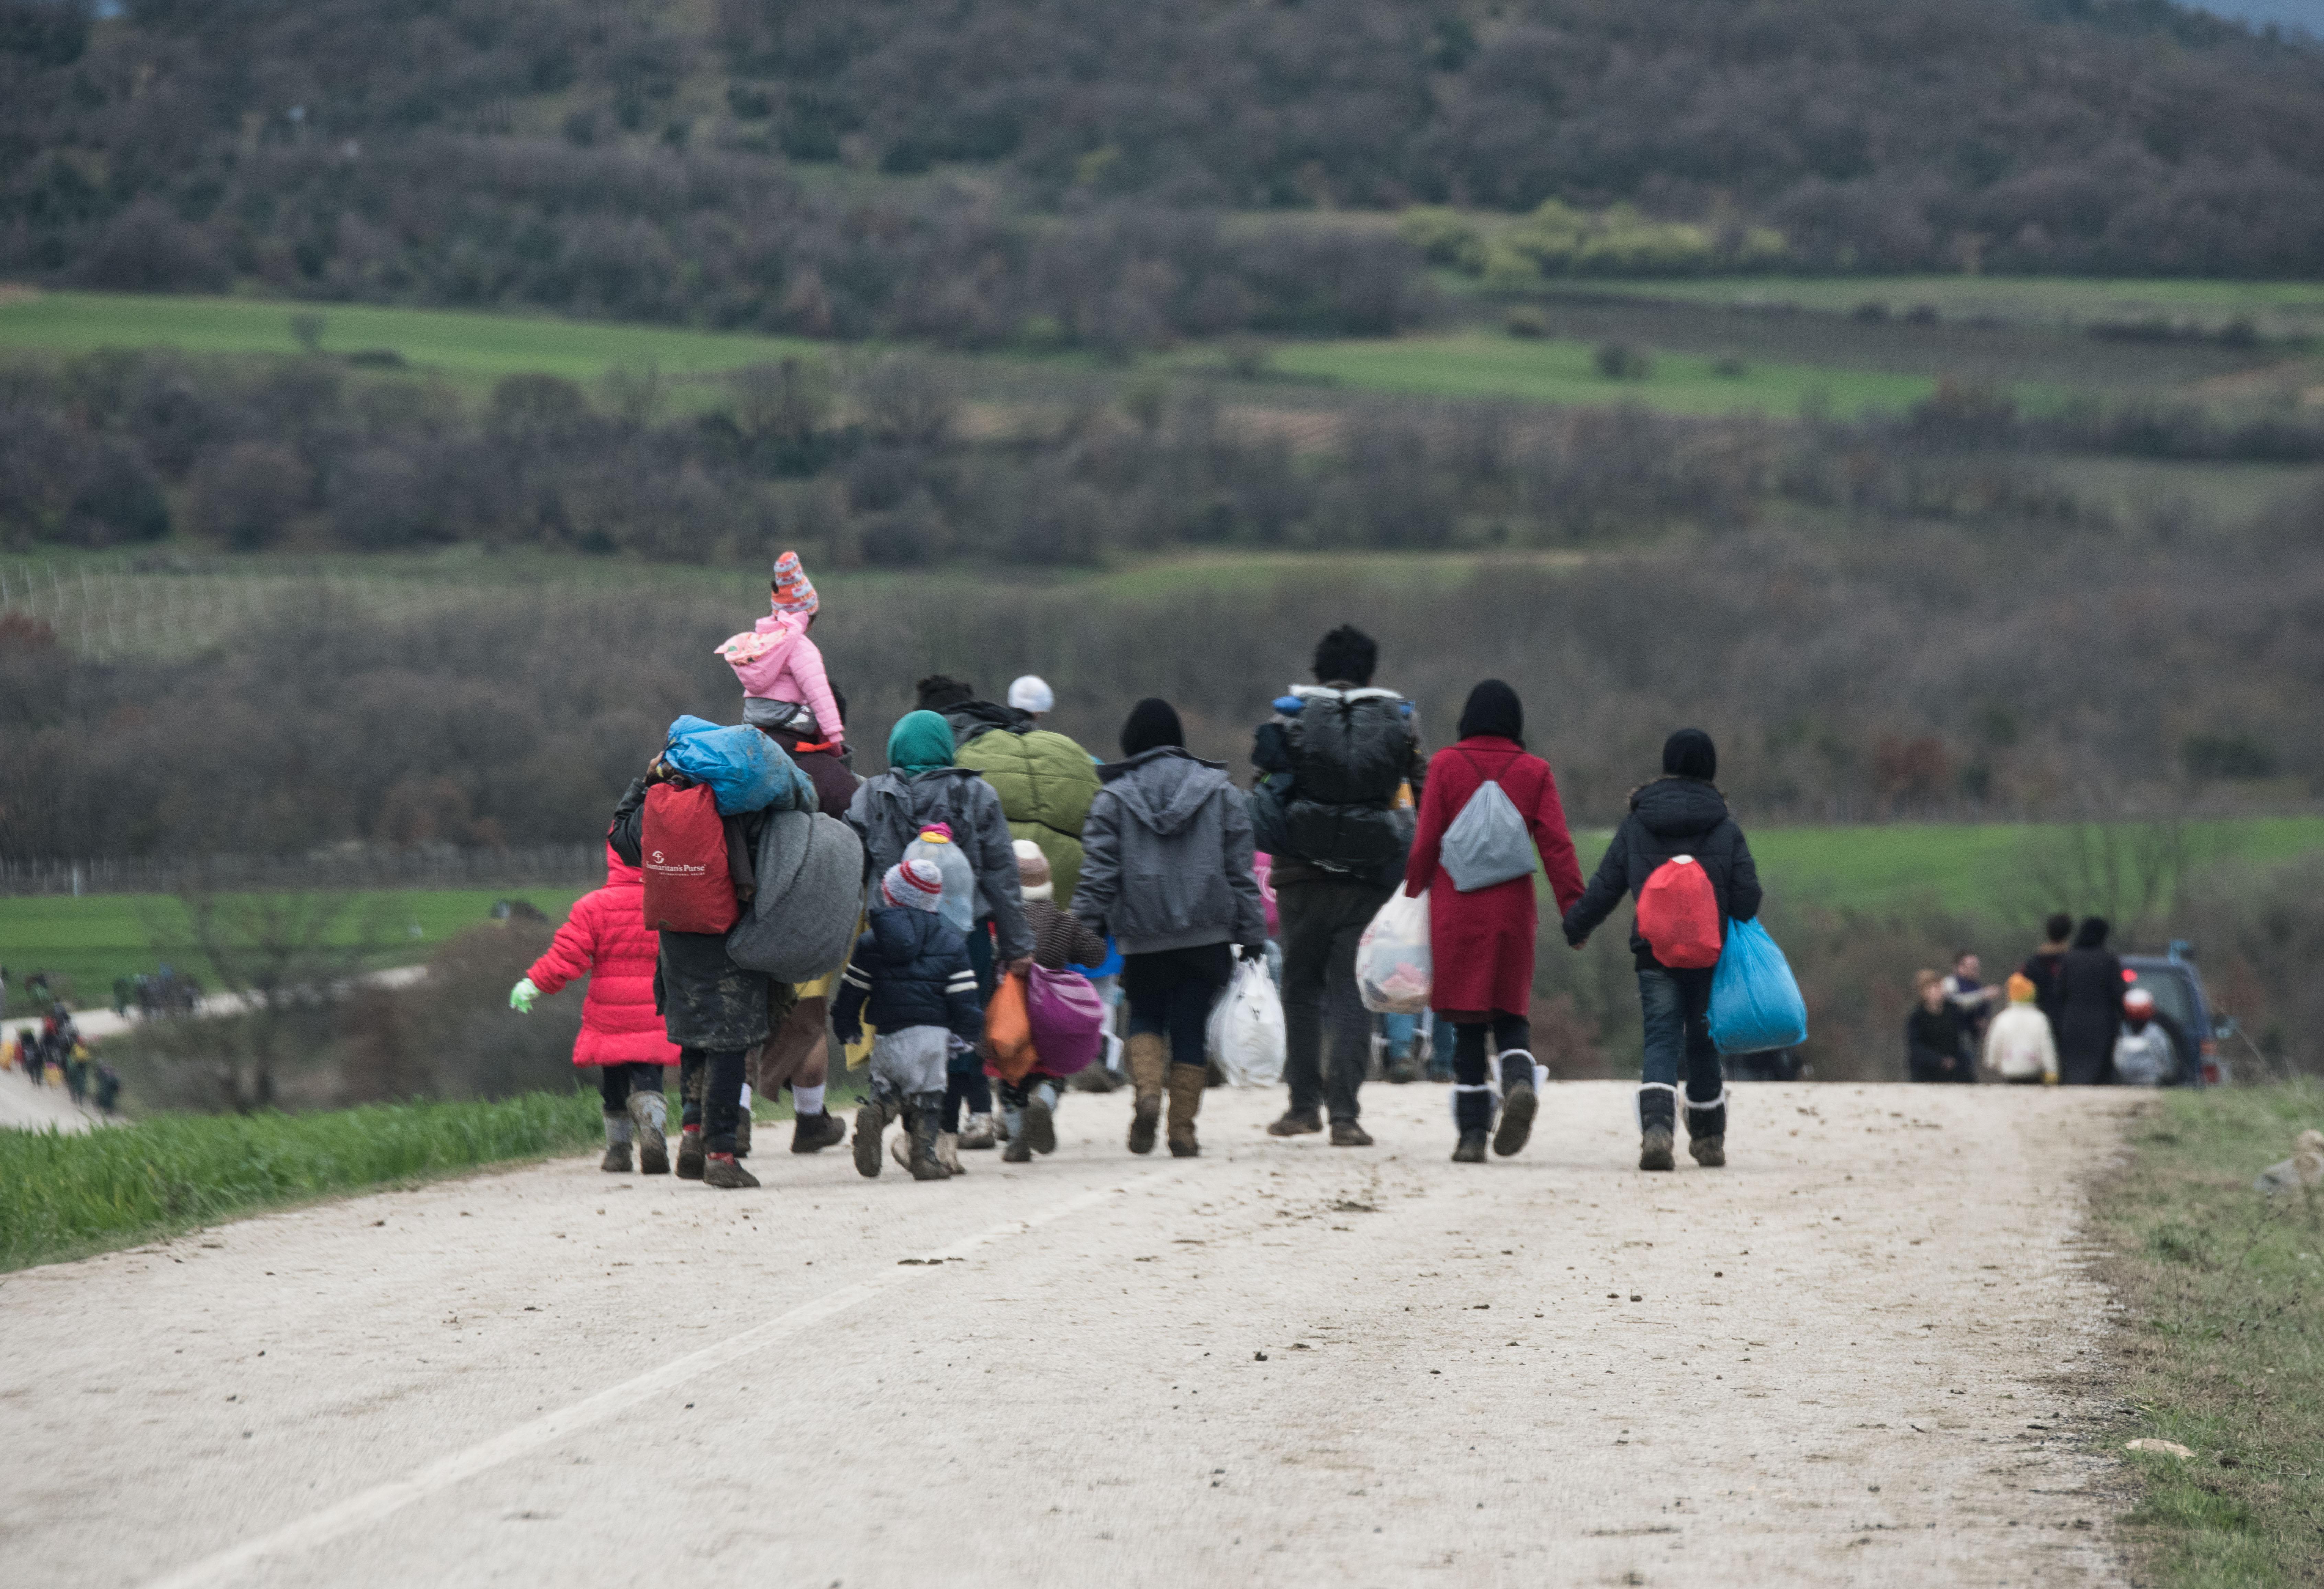 immigrants cross the border between Greece and Macedonia